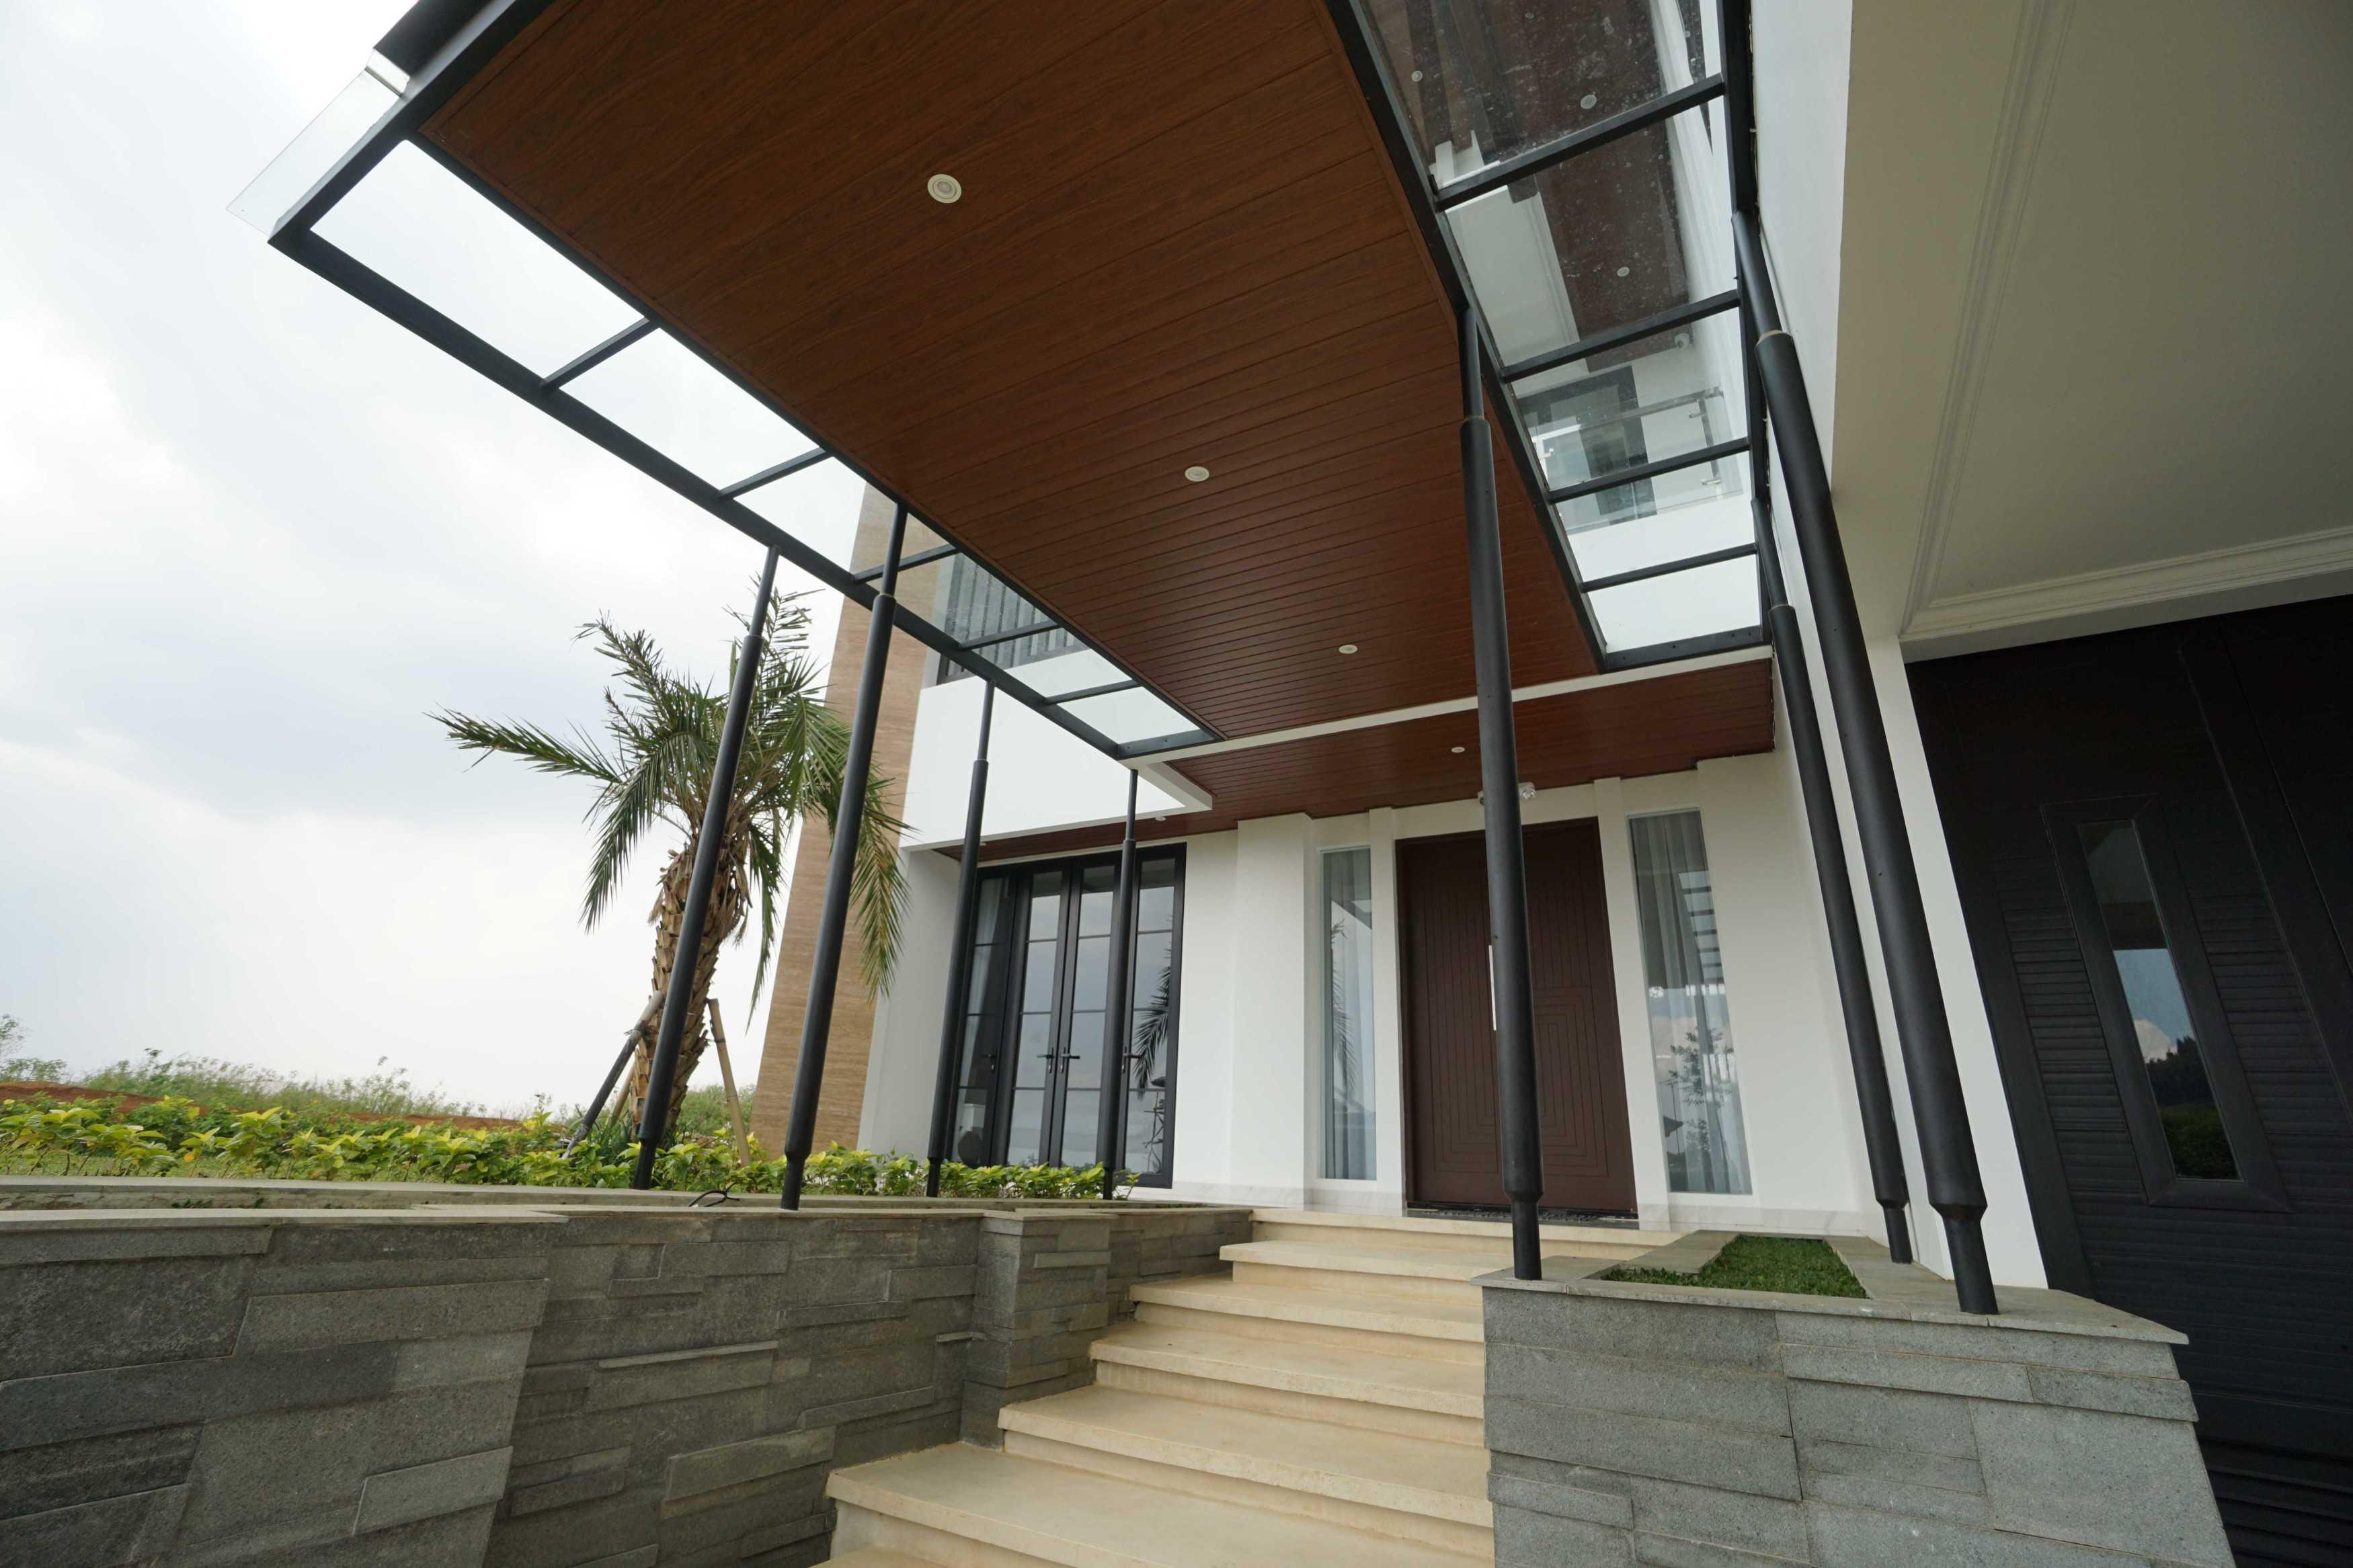 Emporio Architect Hasil Konstruksi Rumah Modern Tropis 363 @ Bandung Bandung, Kota Bandung, Jawa Barat, Indonesia Bandung, Kota Bandung, Jawa Barat, Indonesia Emporio-Architect-Hasil-Konstruksi-Rumah-Modern-Tropis-363-Bandung   82734